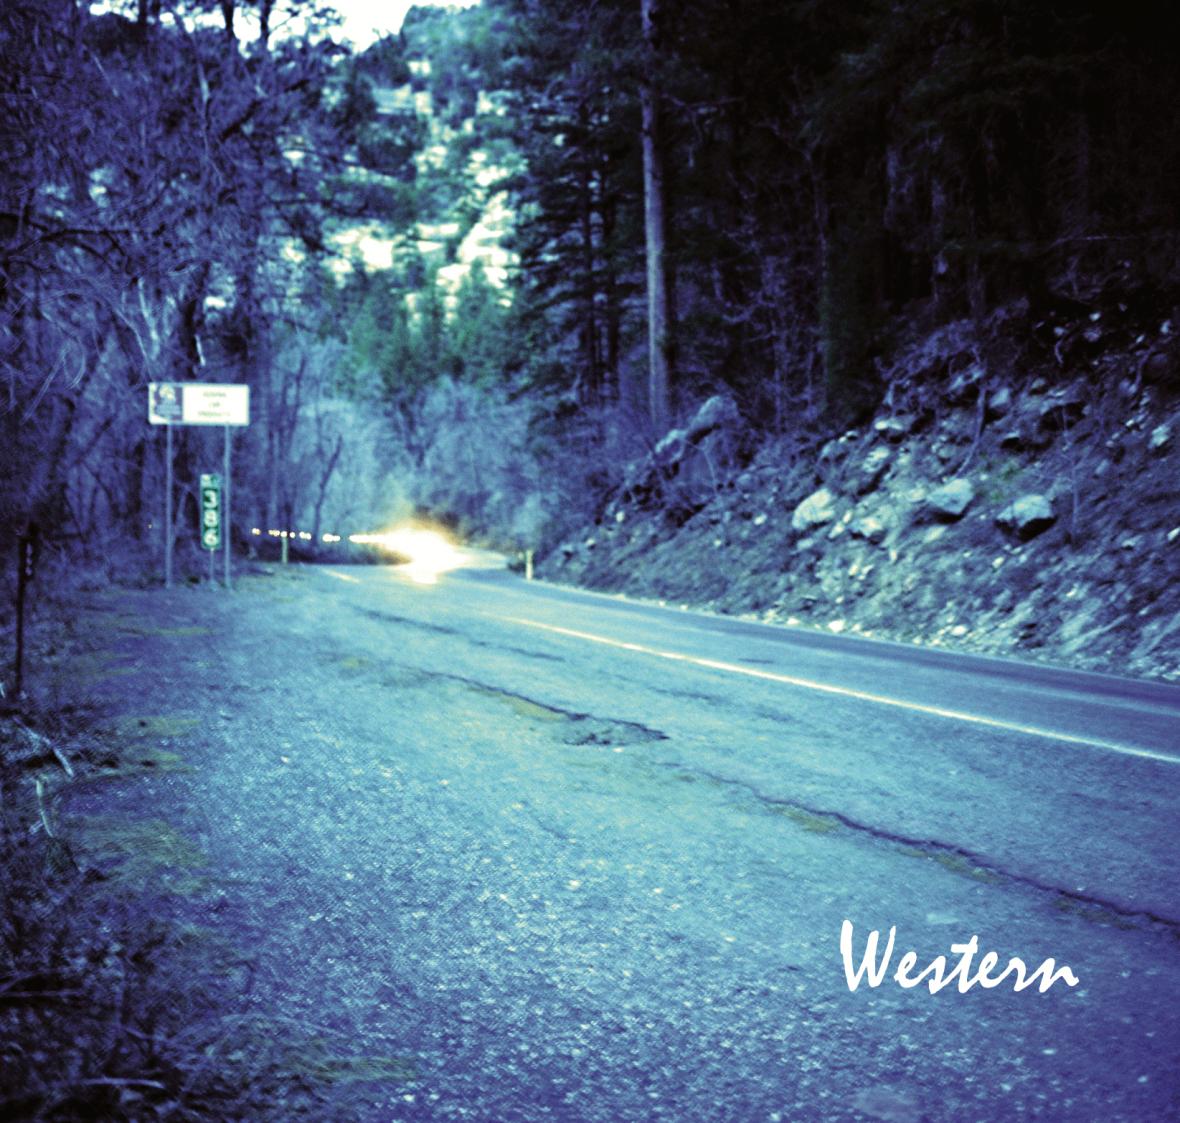 ALBUM-WESTERN_DEFDEFV2